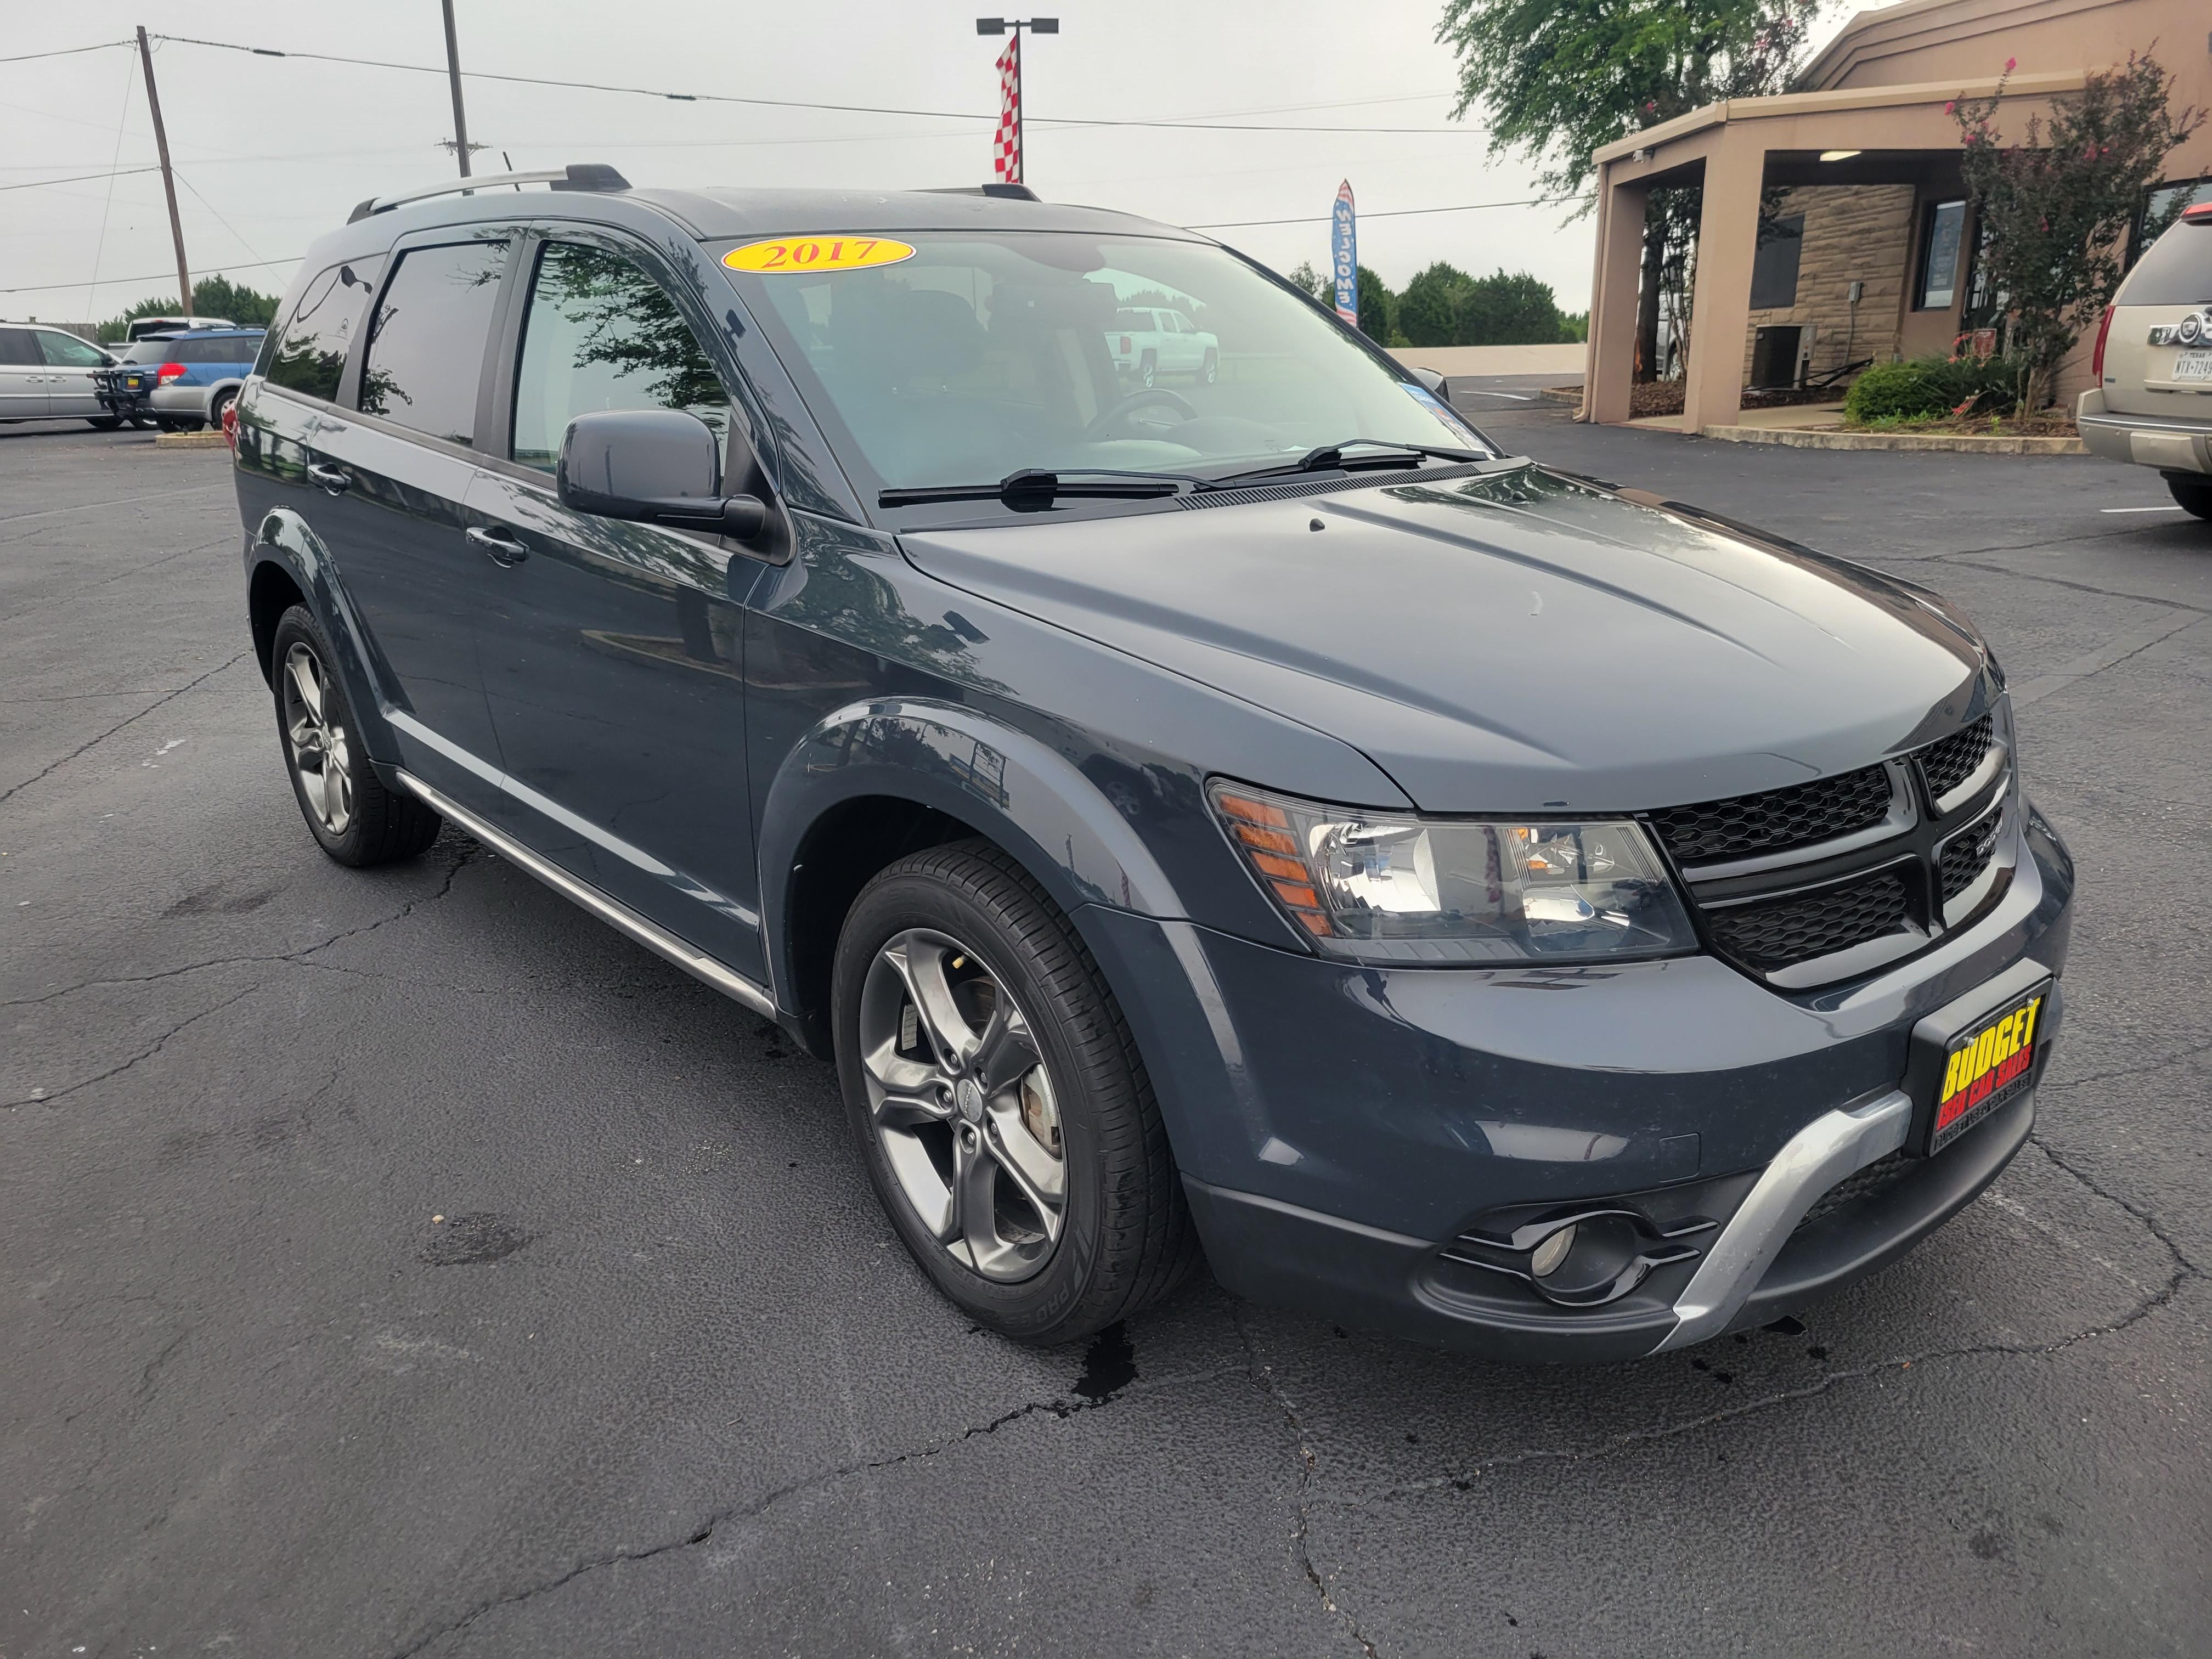 used vehicle - SUV DODGE JOURNEY 2017